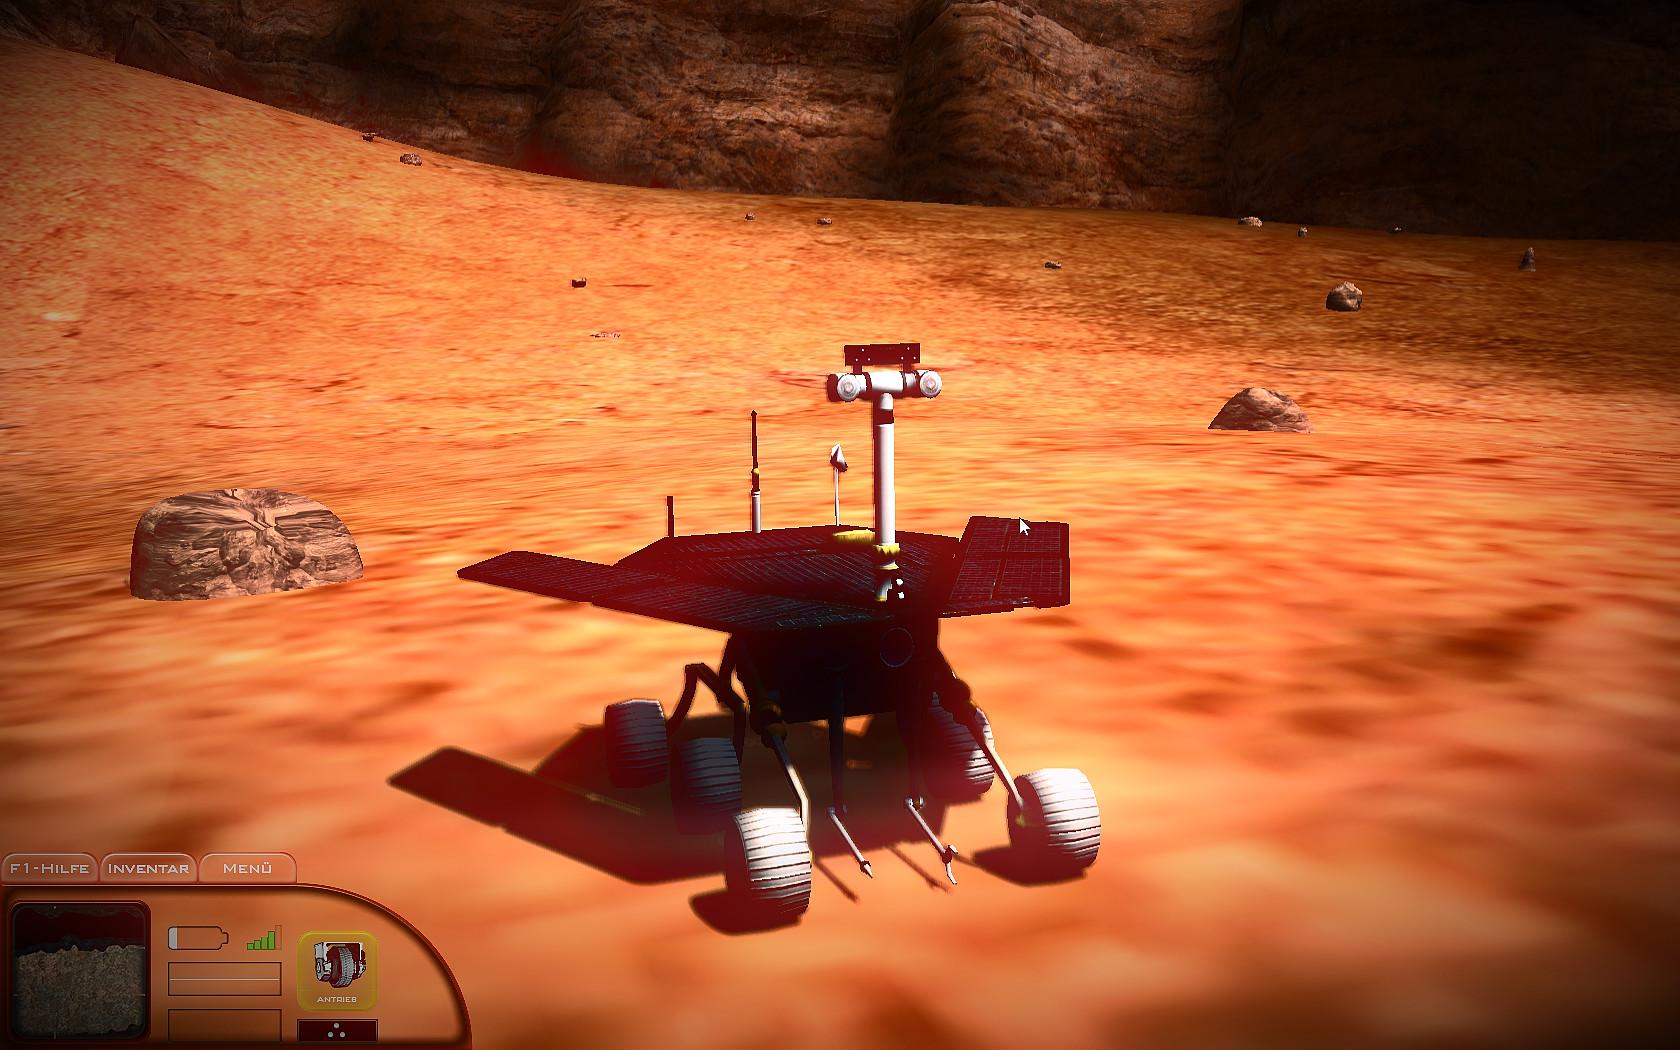 mars rover simulator - photo #12